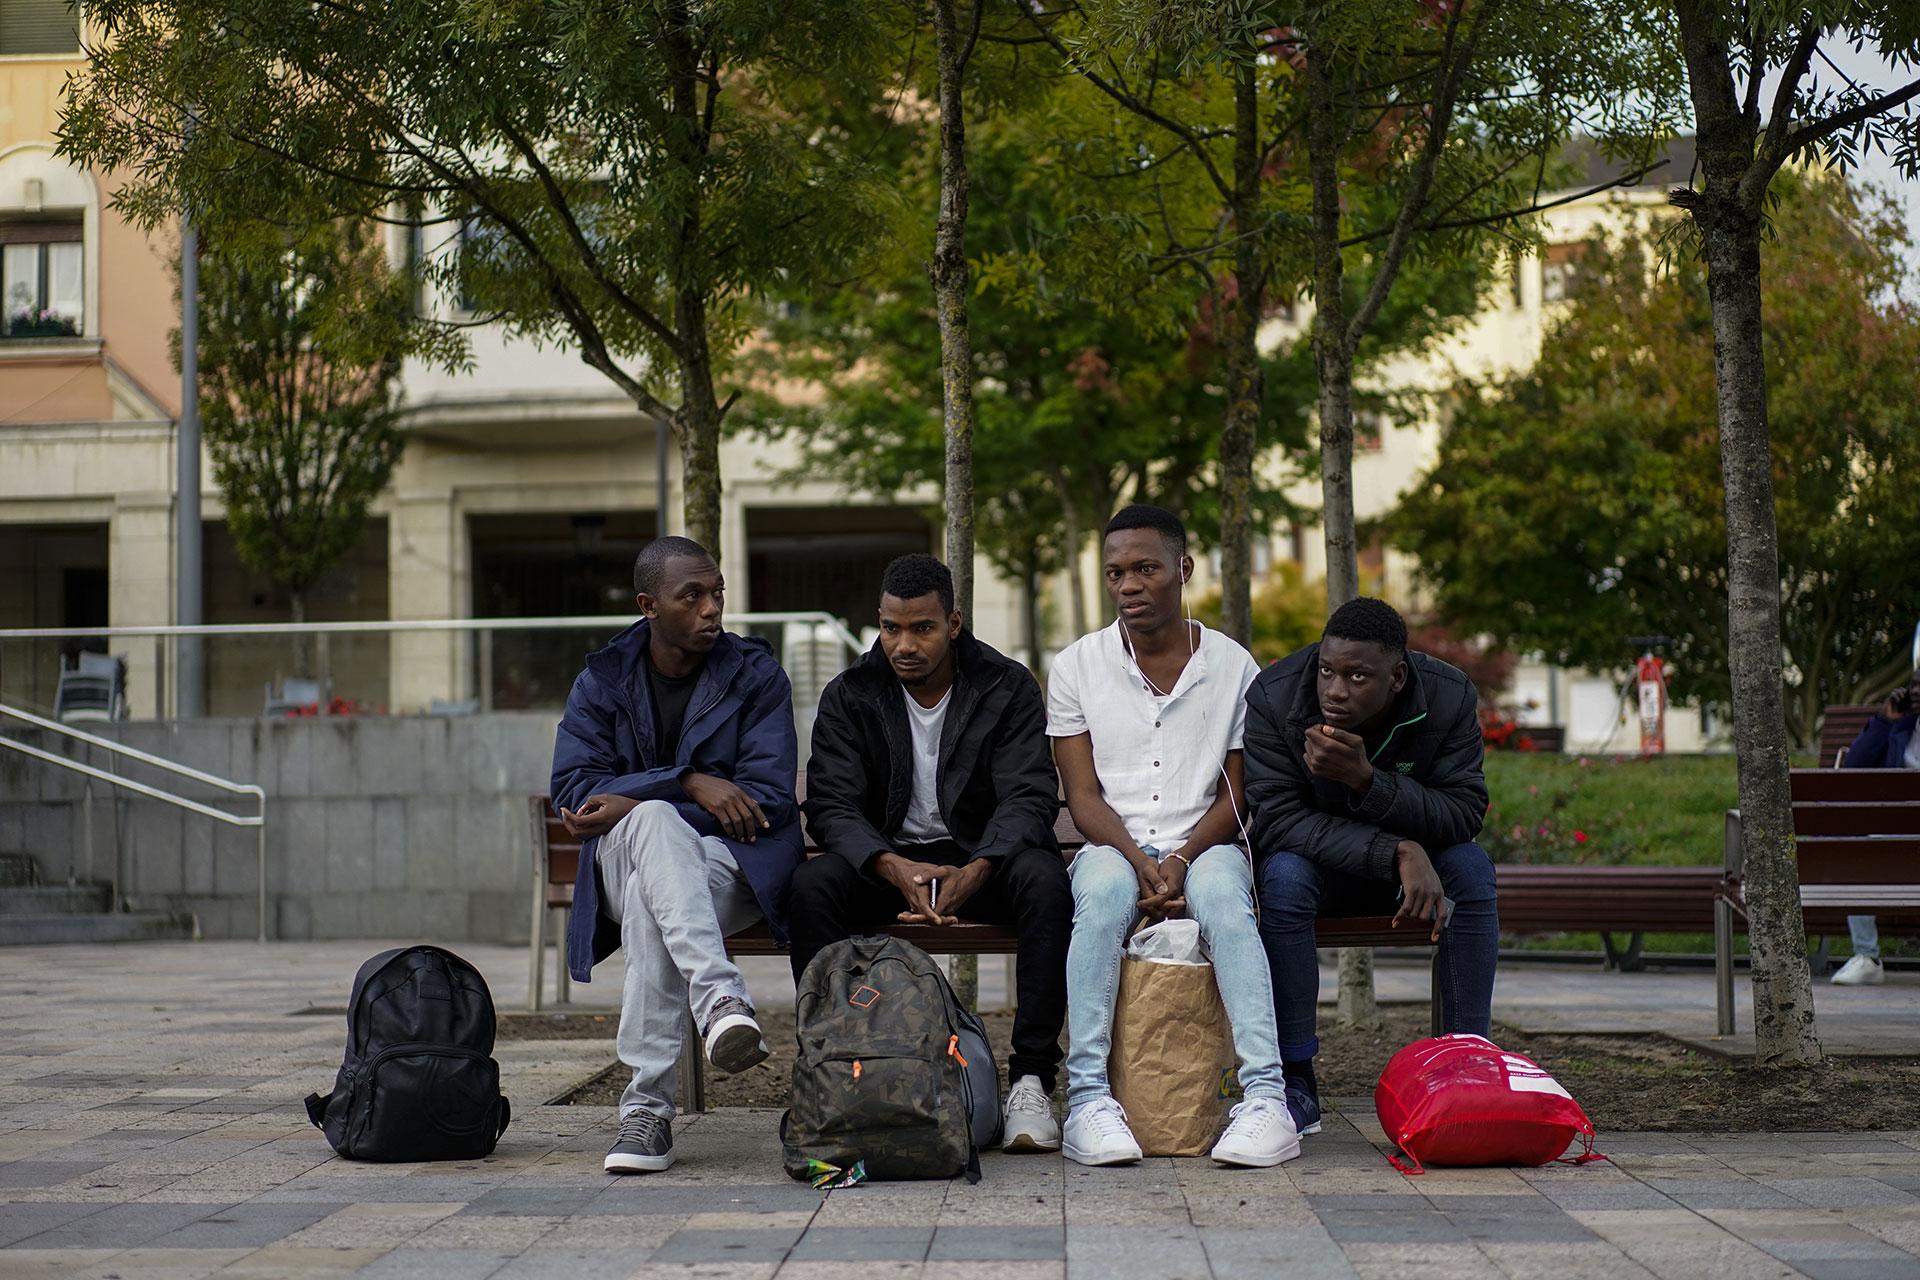 Ousmane espera junto a tres compañeros en una plaza de Irun minutos antes de tomar un autobús para intentar cruzar a Francia, 17 de Septiembre de 2019.